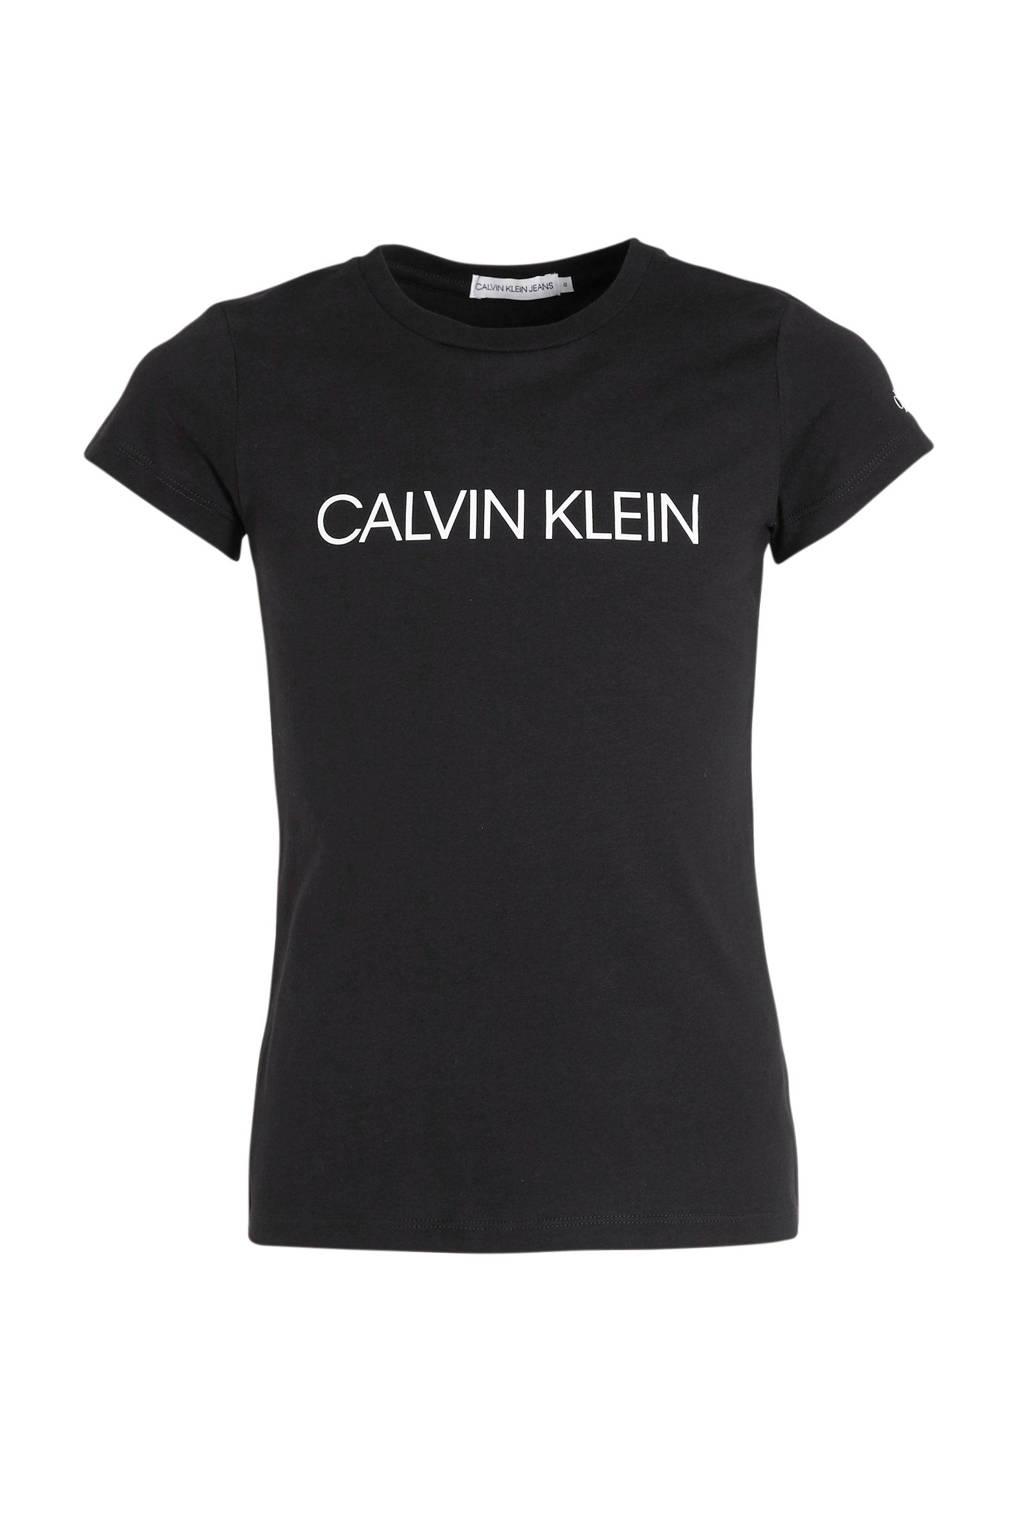 CALVIN KLEIN JEANS slim fit T-shirt met logo zwart, Zwart